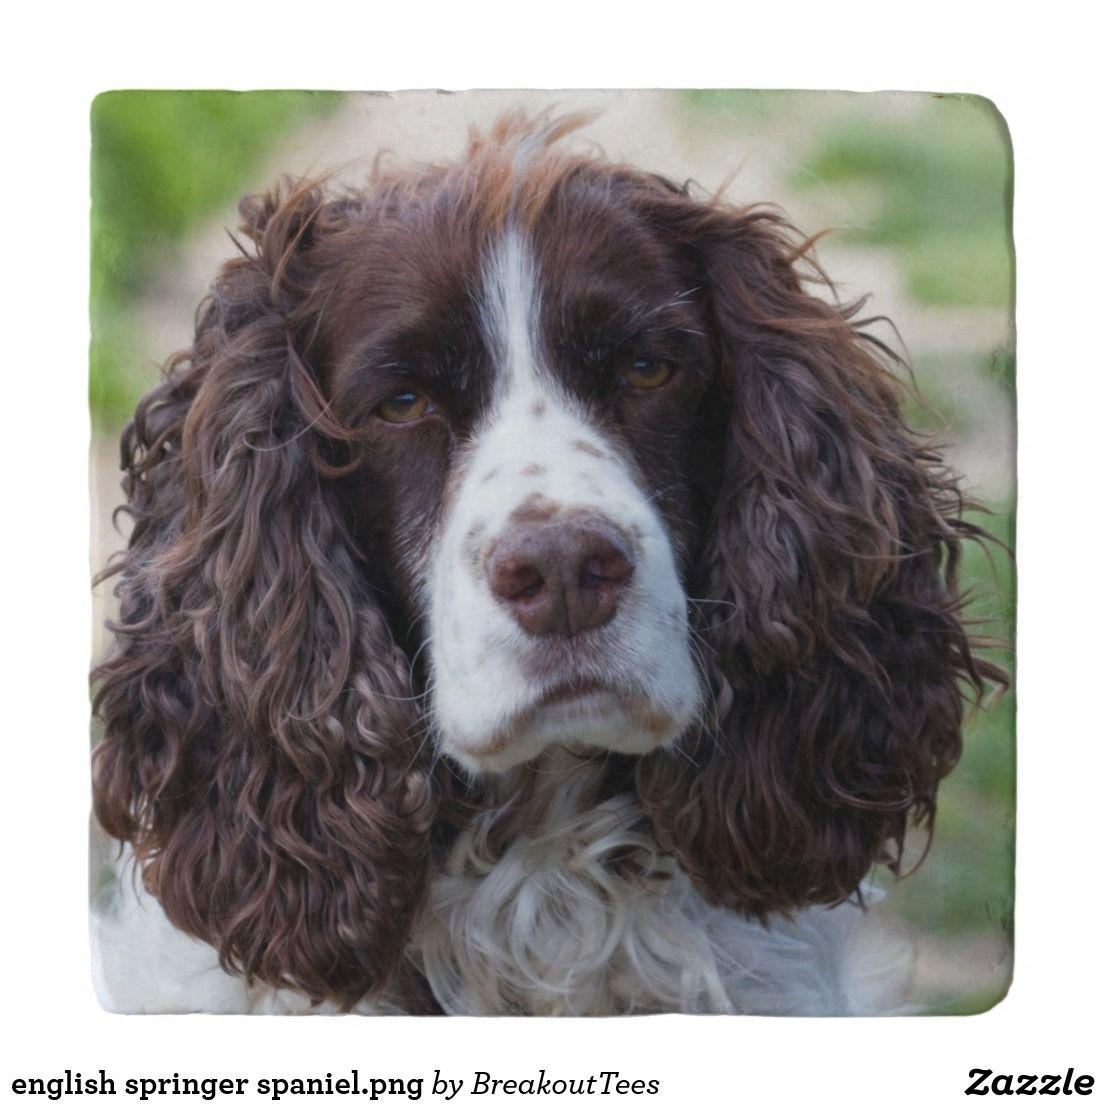 English Springer Spaniel Png Trivet Zazzle Com In 2020 Springer Spaniel English Springer Spaniel English Springer